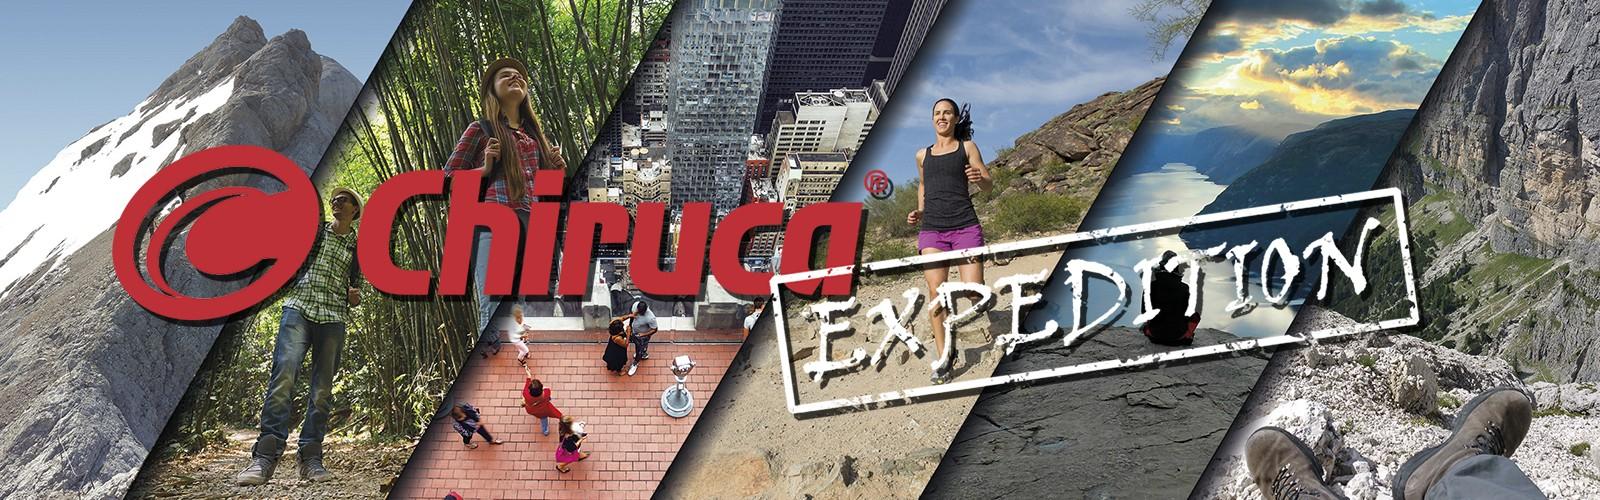 Ruszaj w drogę z Chiruca EXPEDITION